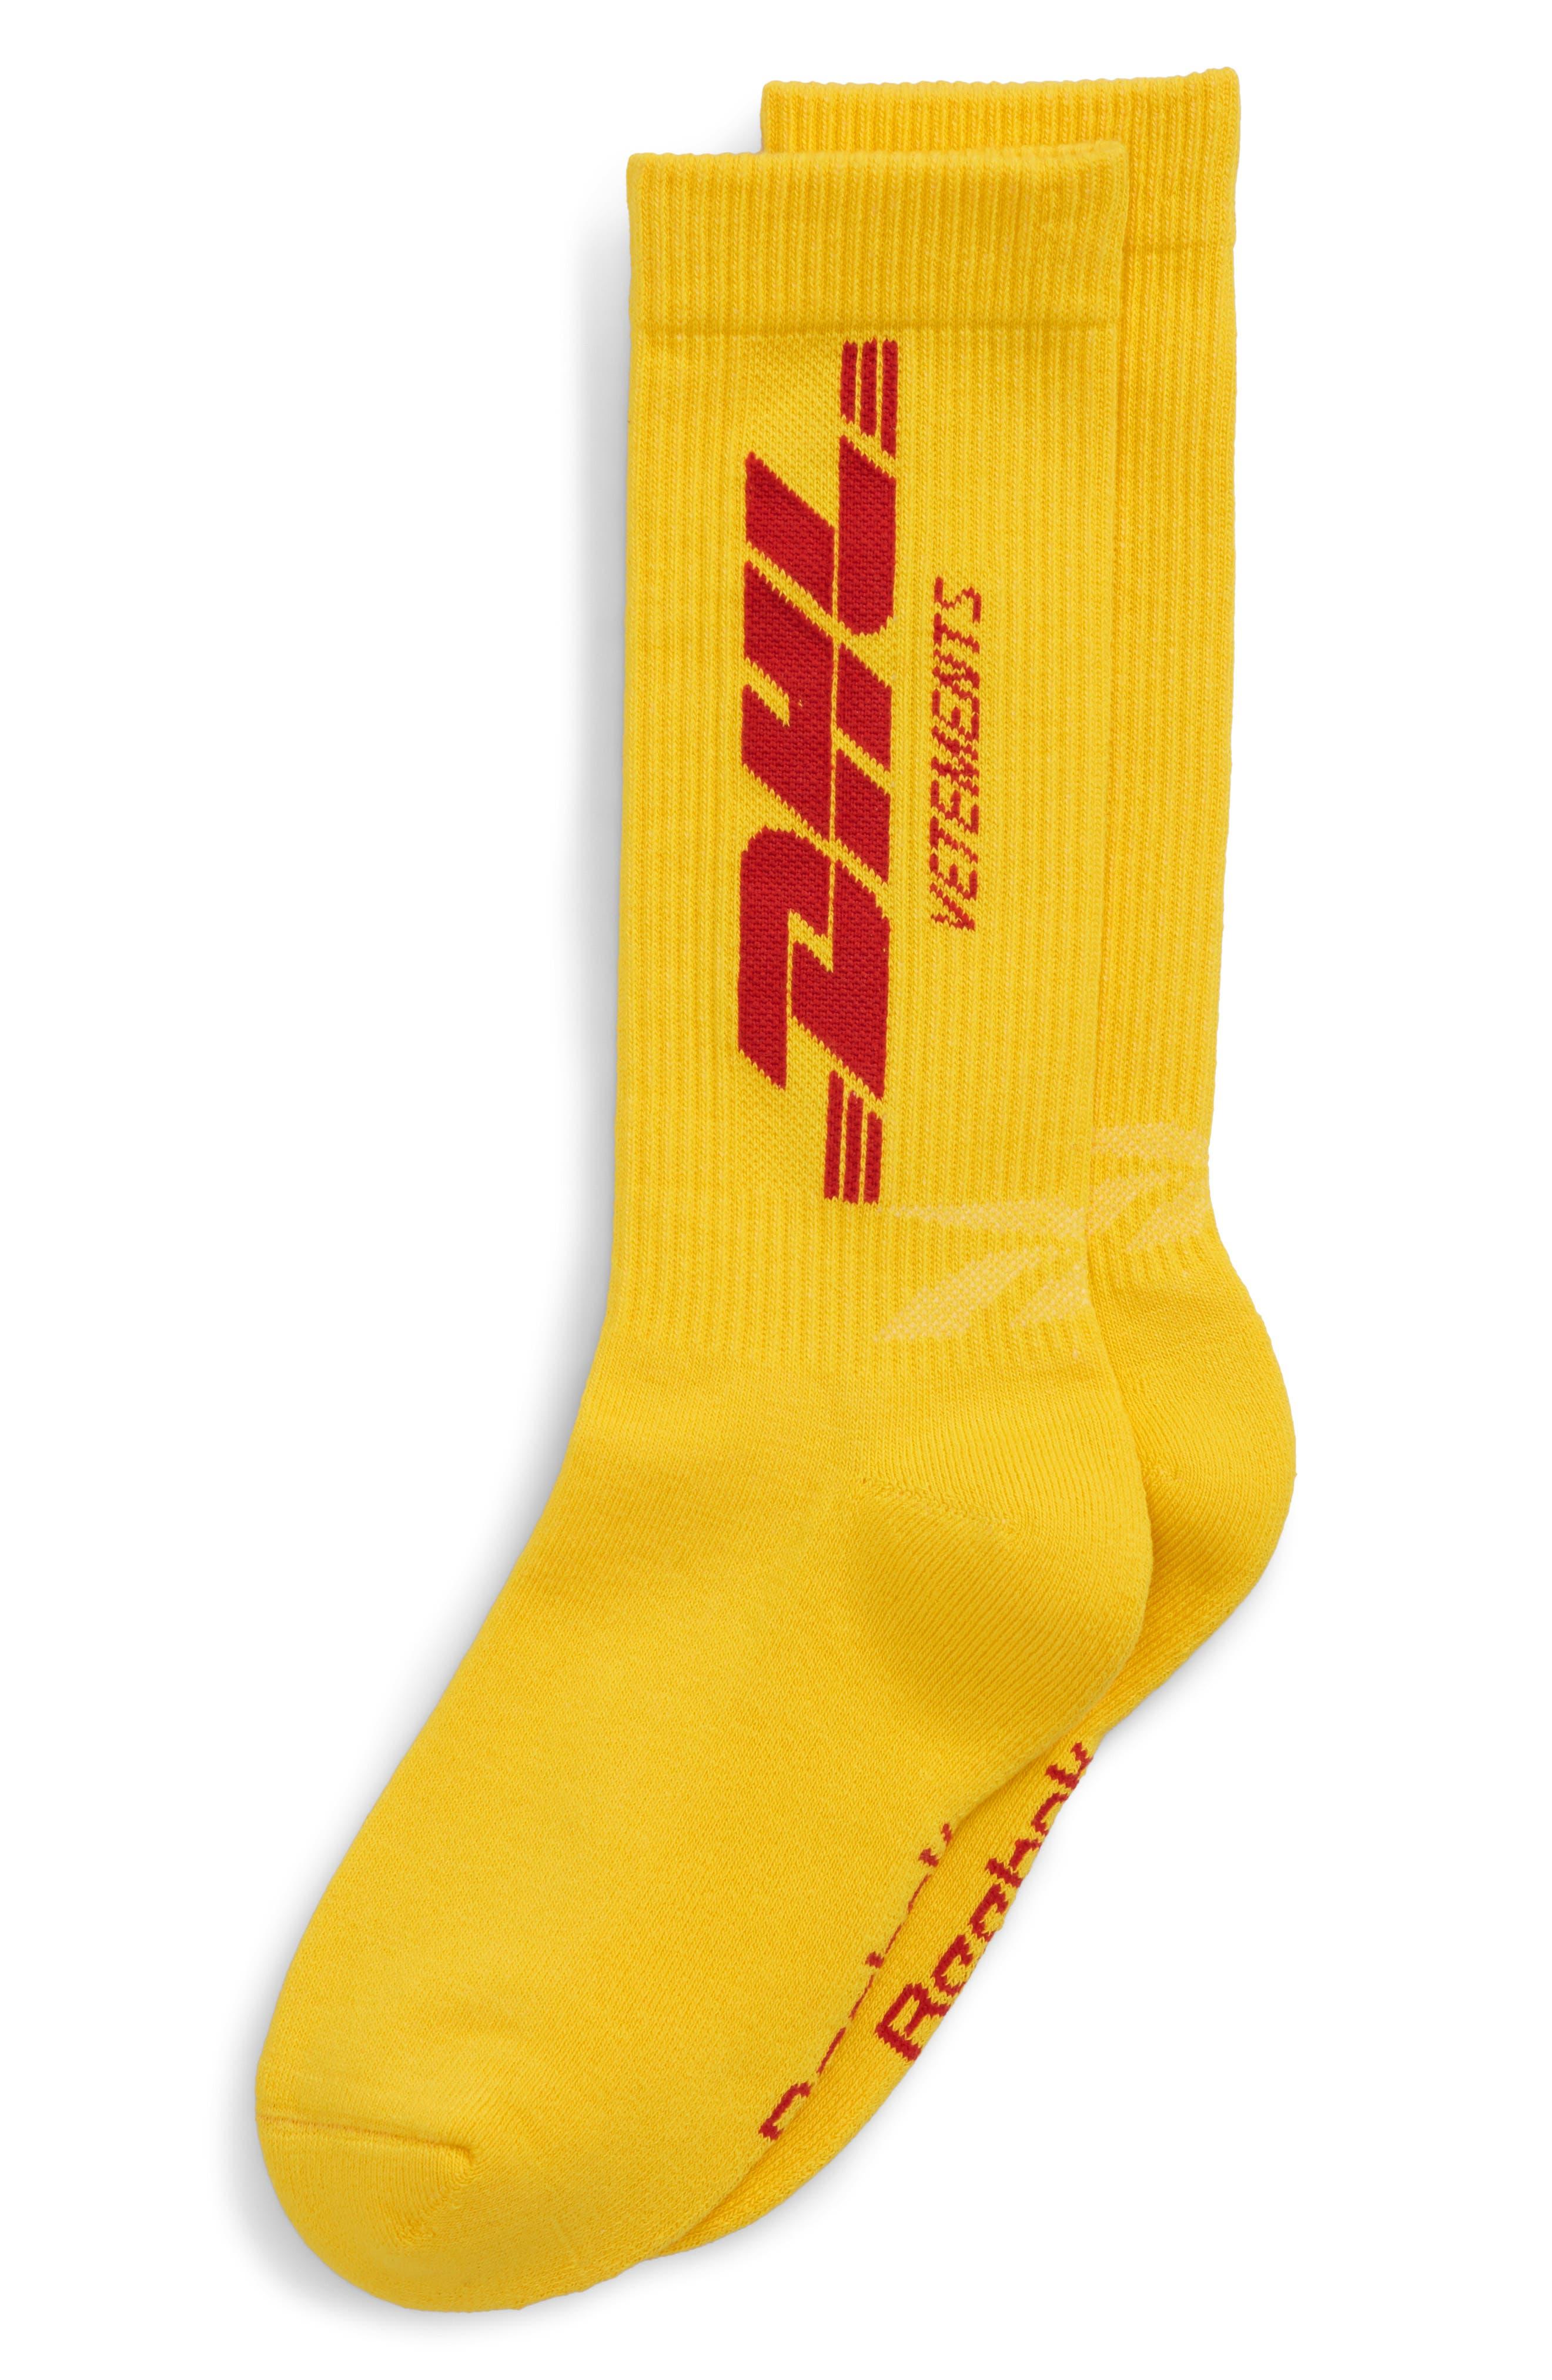 DHL Socks,                             Main thumbnail 1, color,                             700